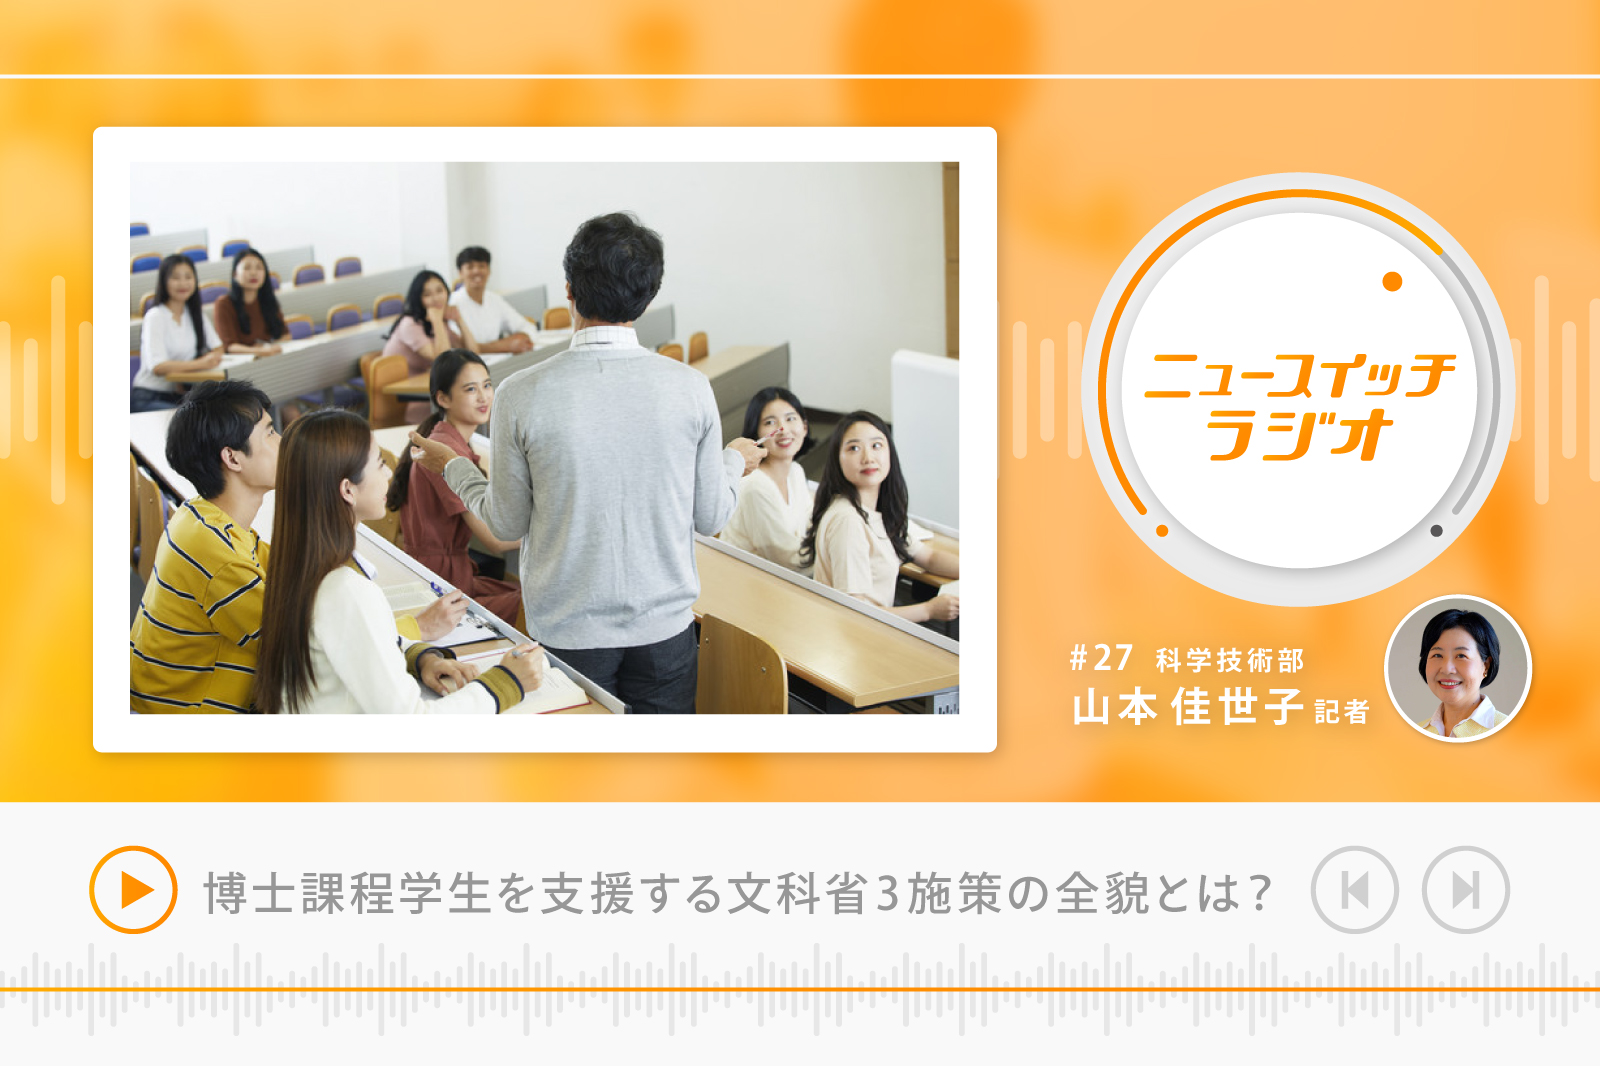 【音声解説】博士課程学生を支援する文科省3施策の全貌